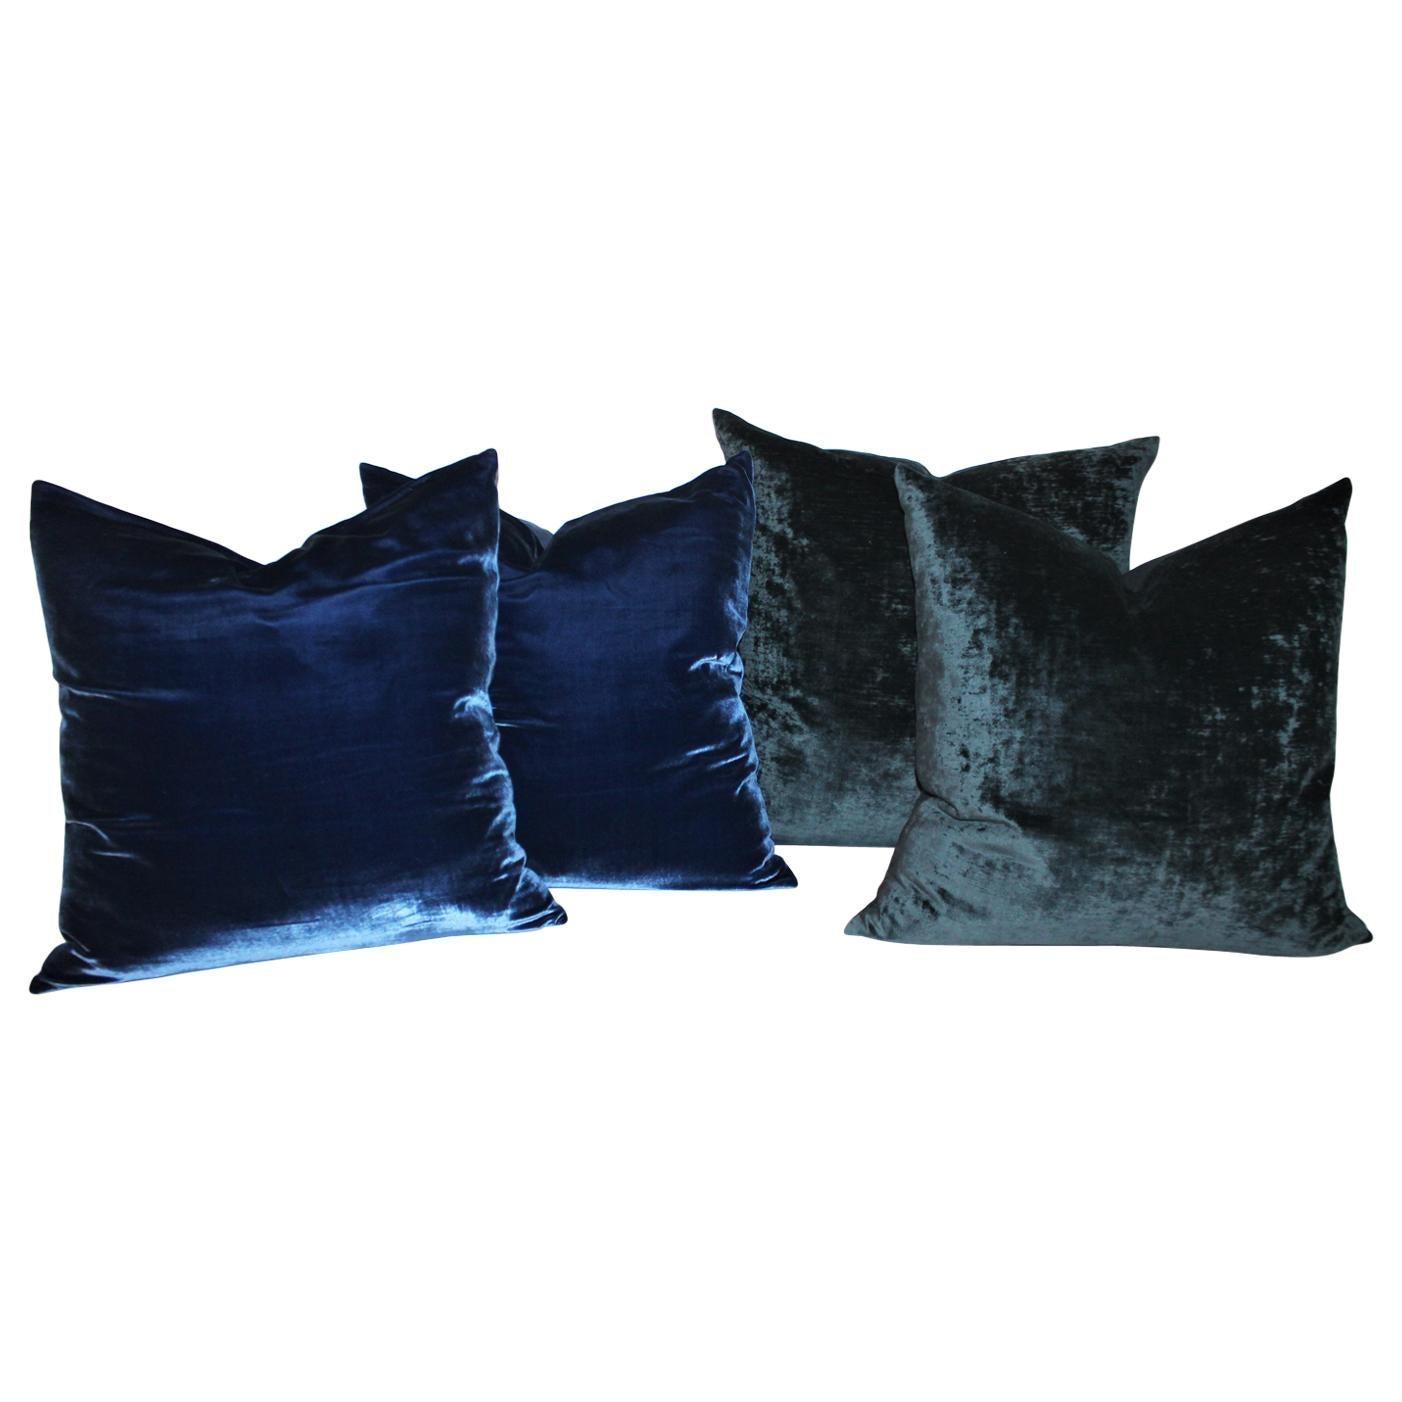 Indigo Blue Pillows, Pair at 1stDibs